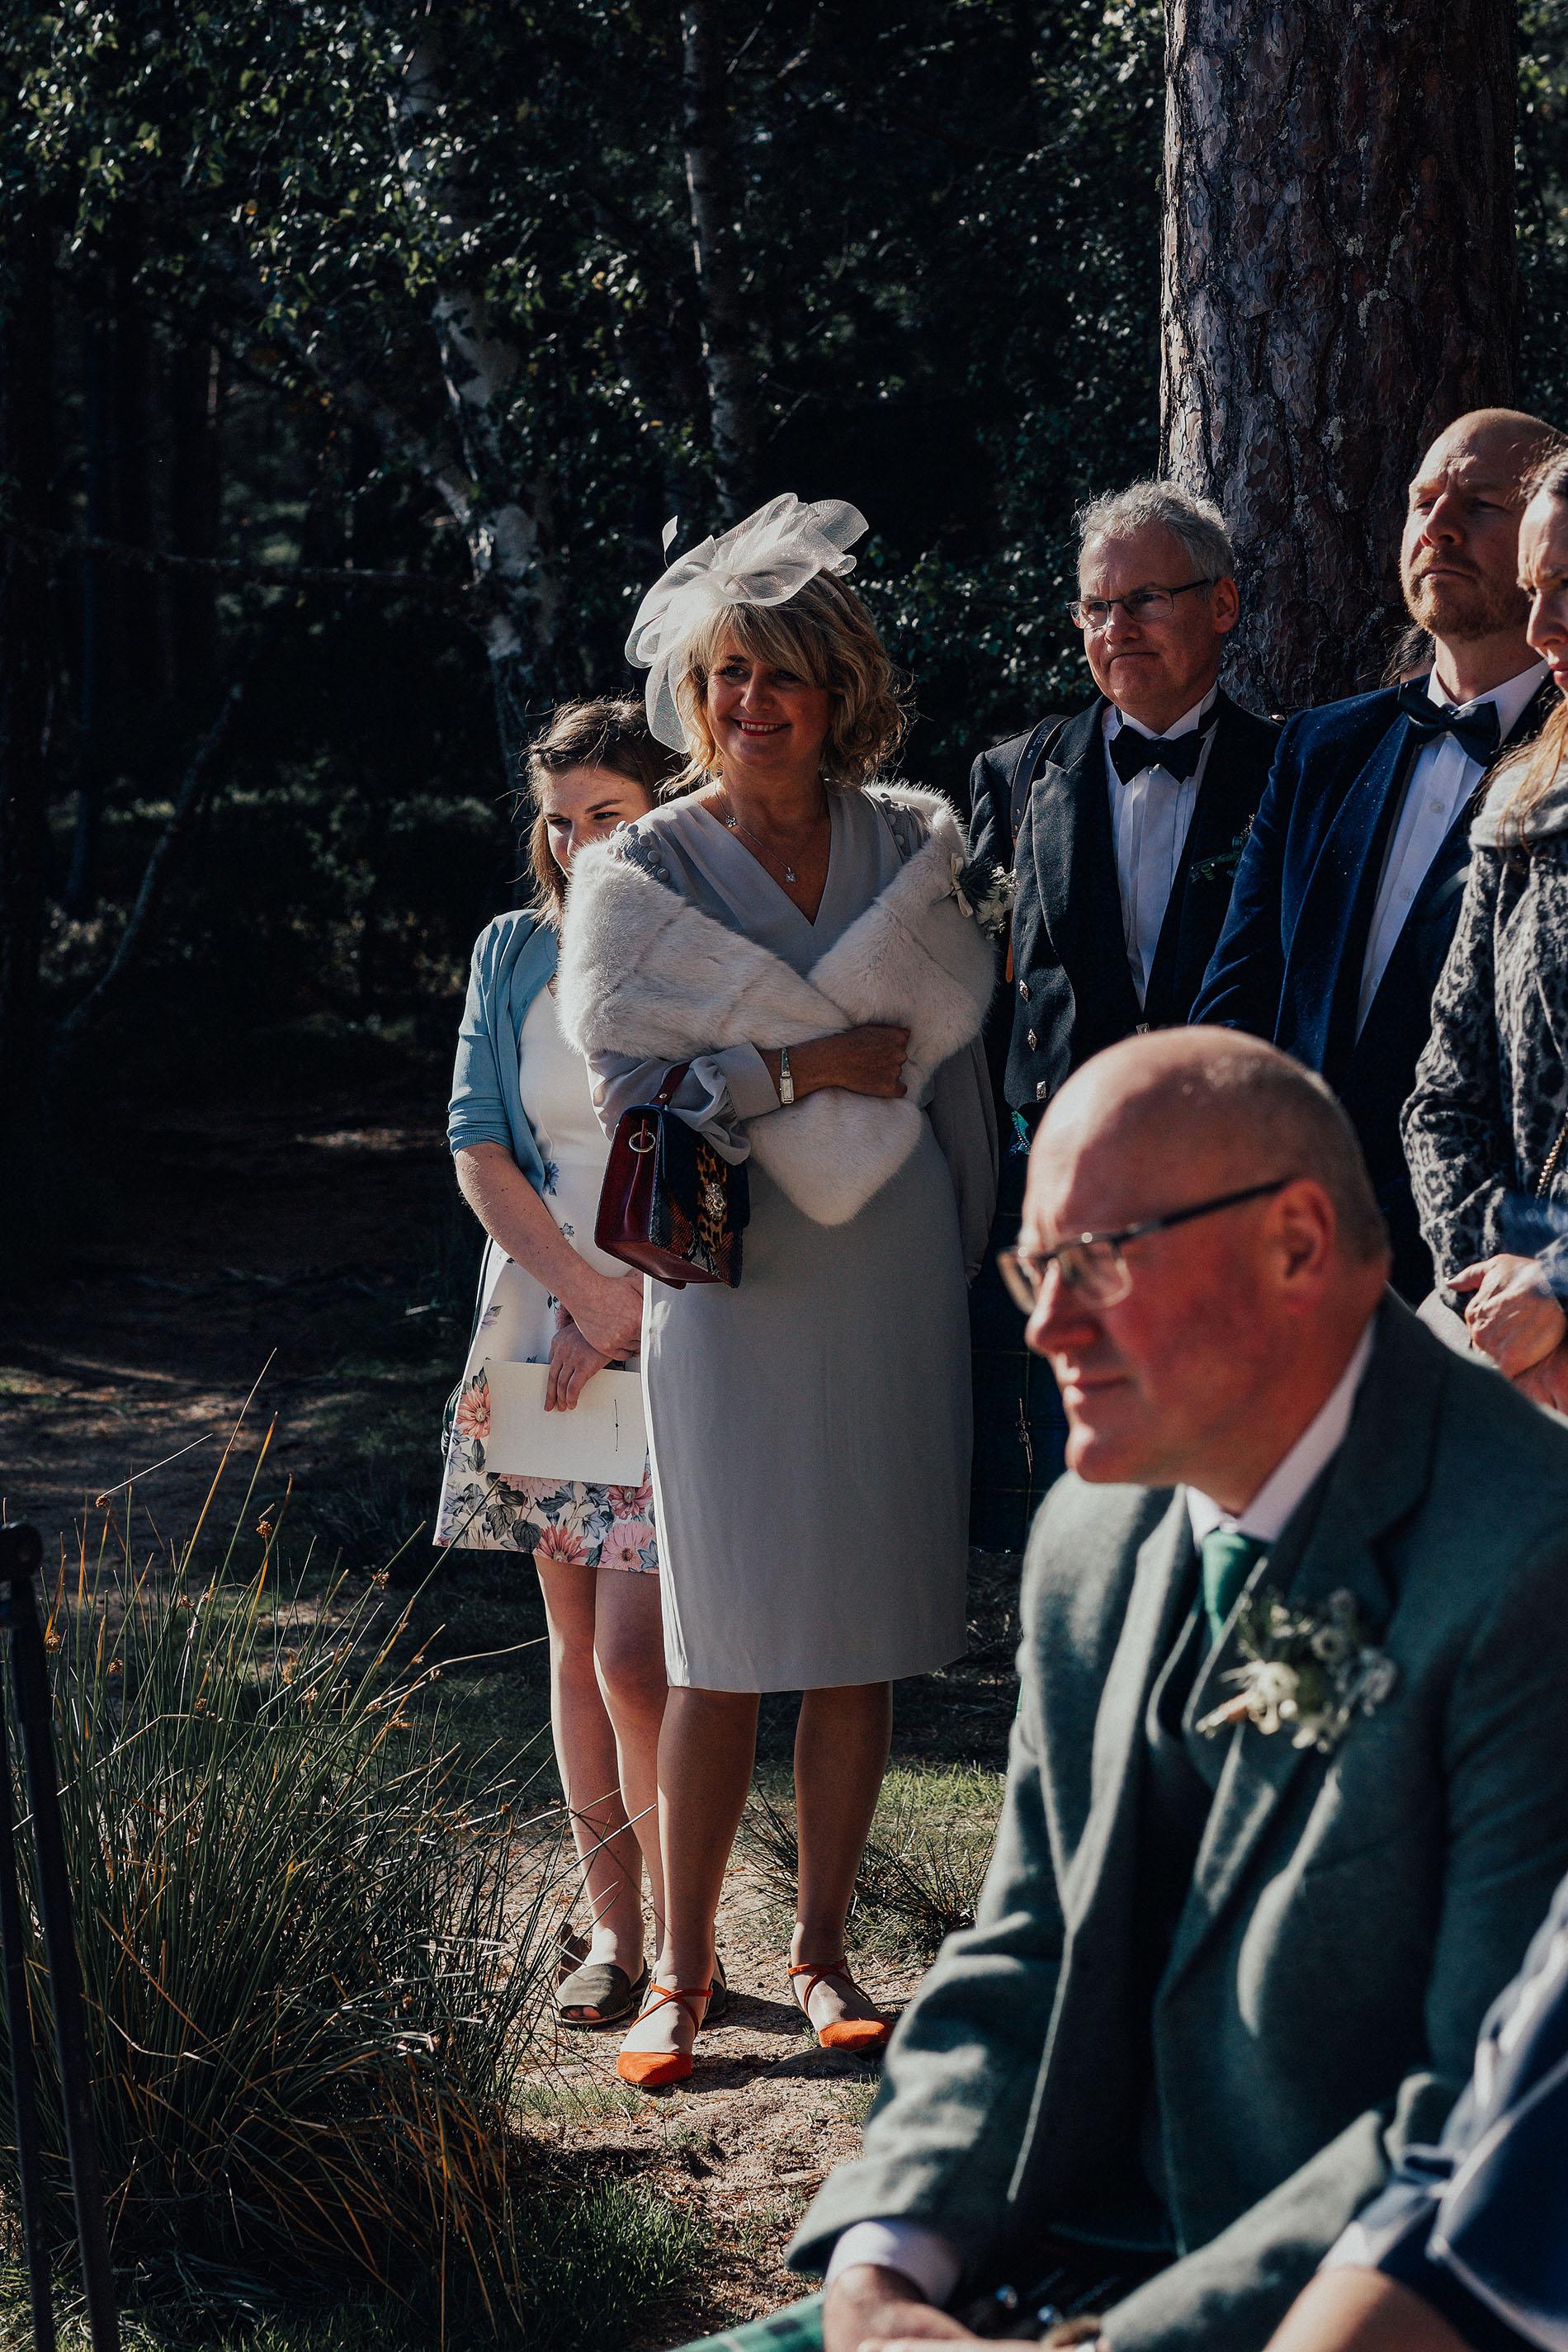 LOCH_GARTEN_DIY_WEDDING_PJ_PHILLIPS_PHOTOGRAPHY_97.jpg